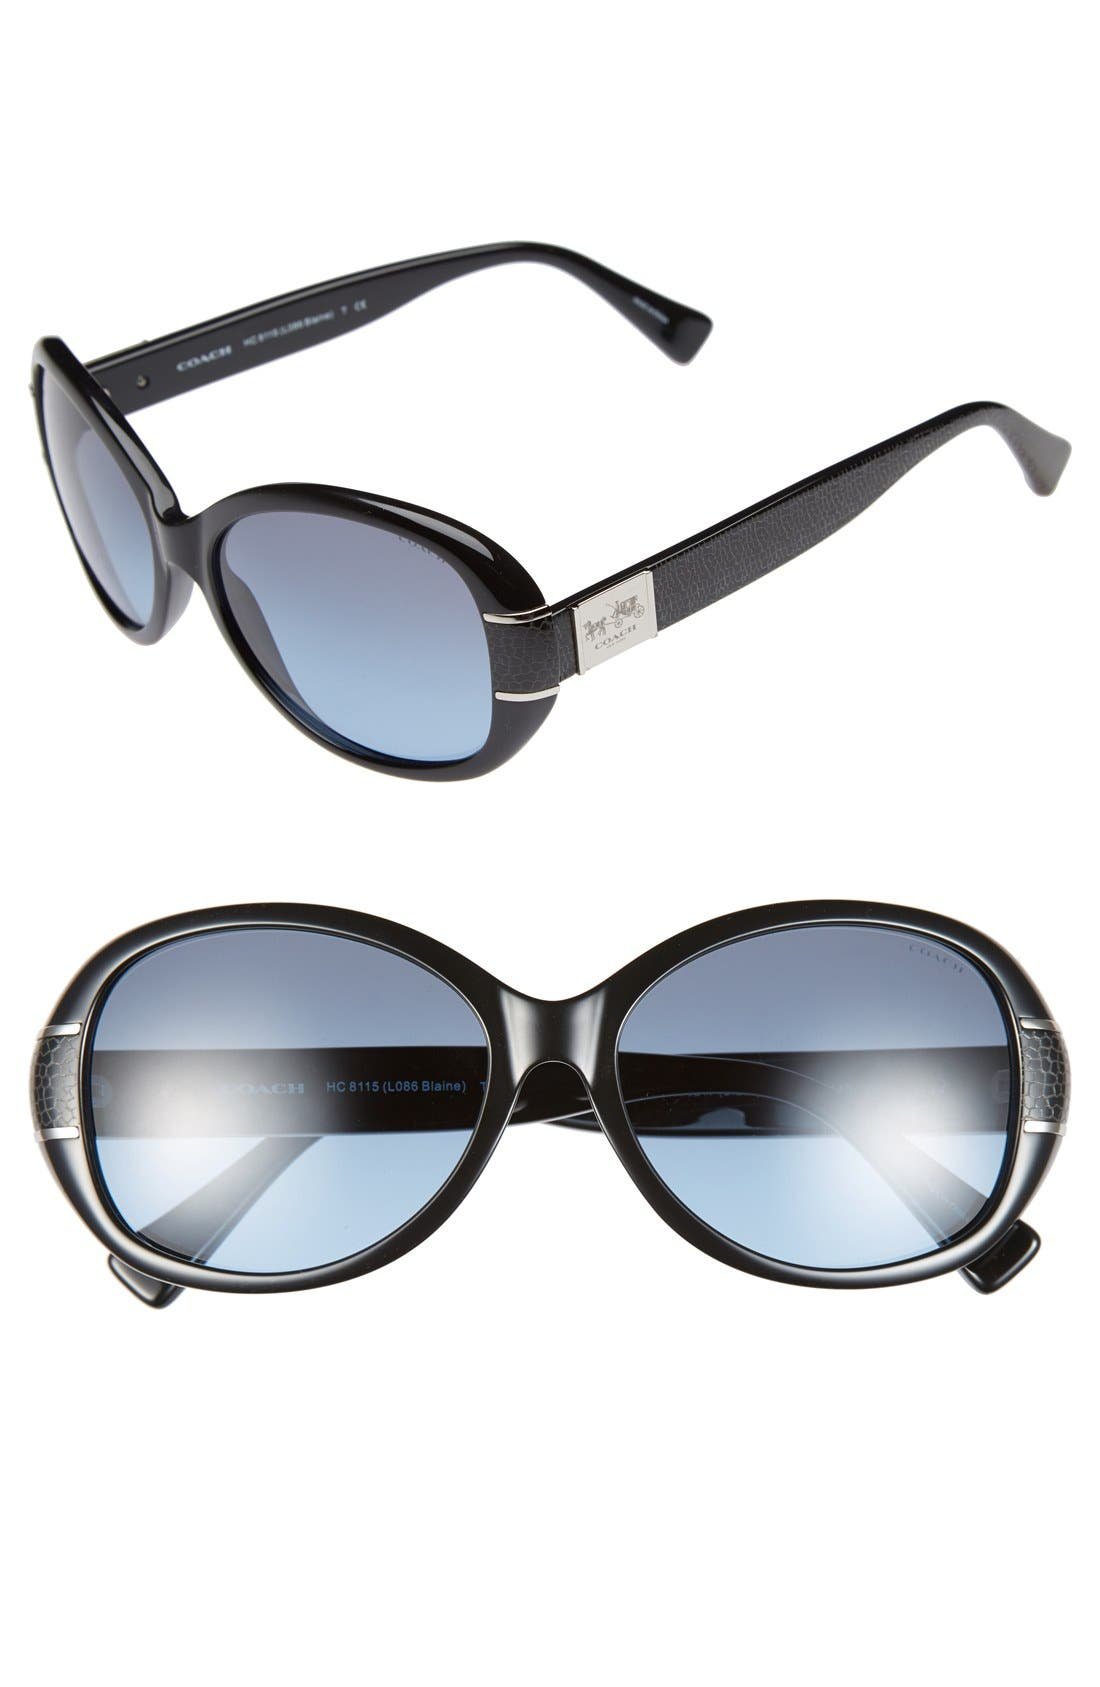 Main Image - COACH 'Blaine' 57mm Sunglasses